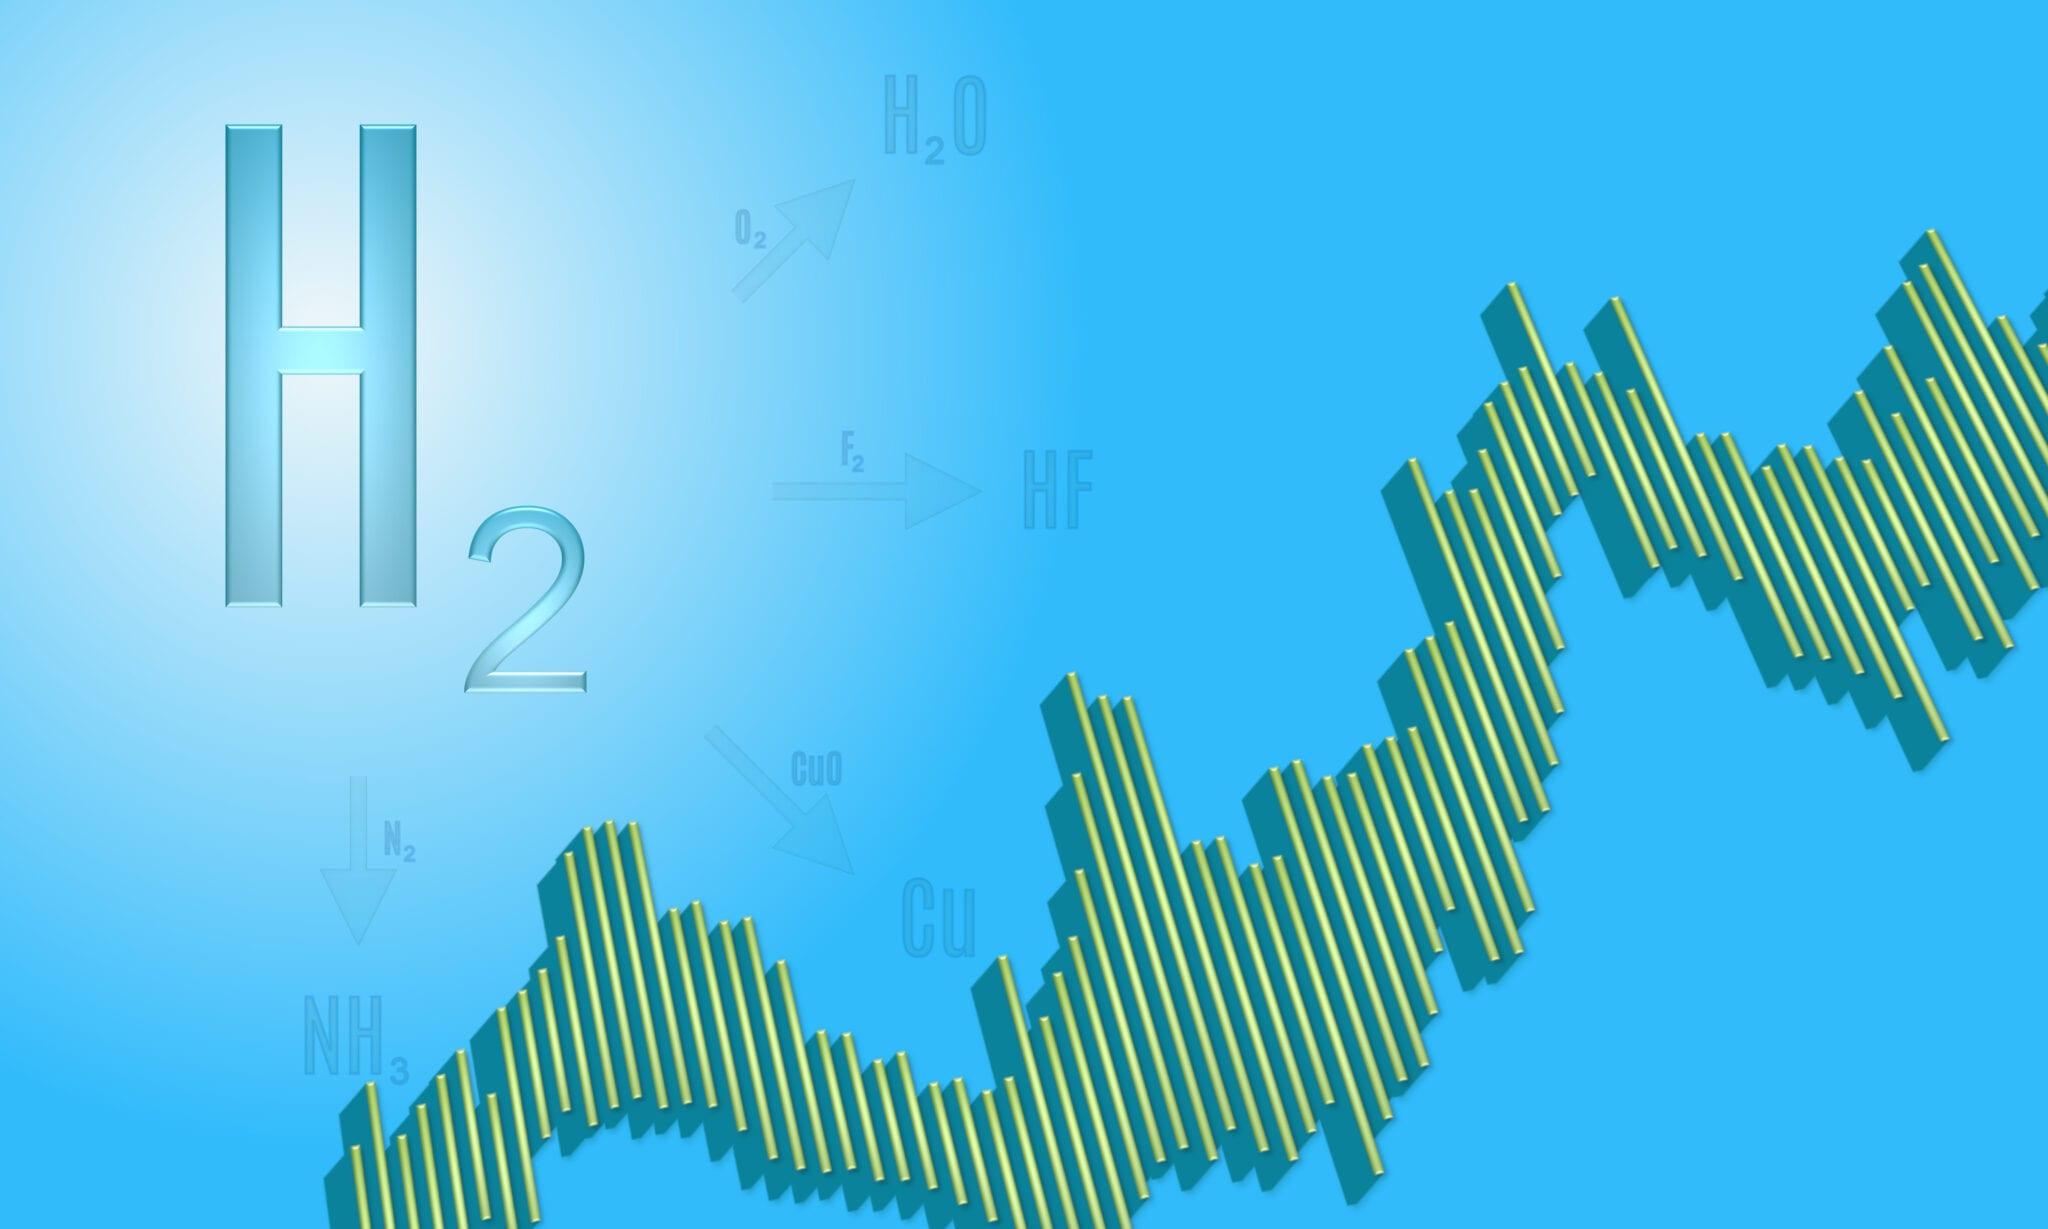 Hydrogen energy stocks chart.